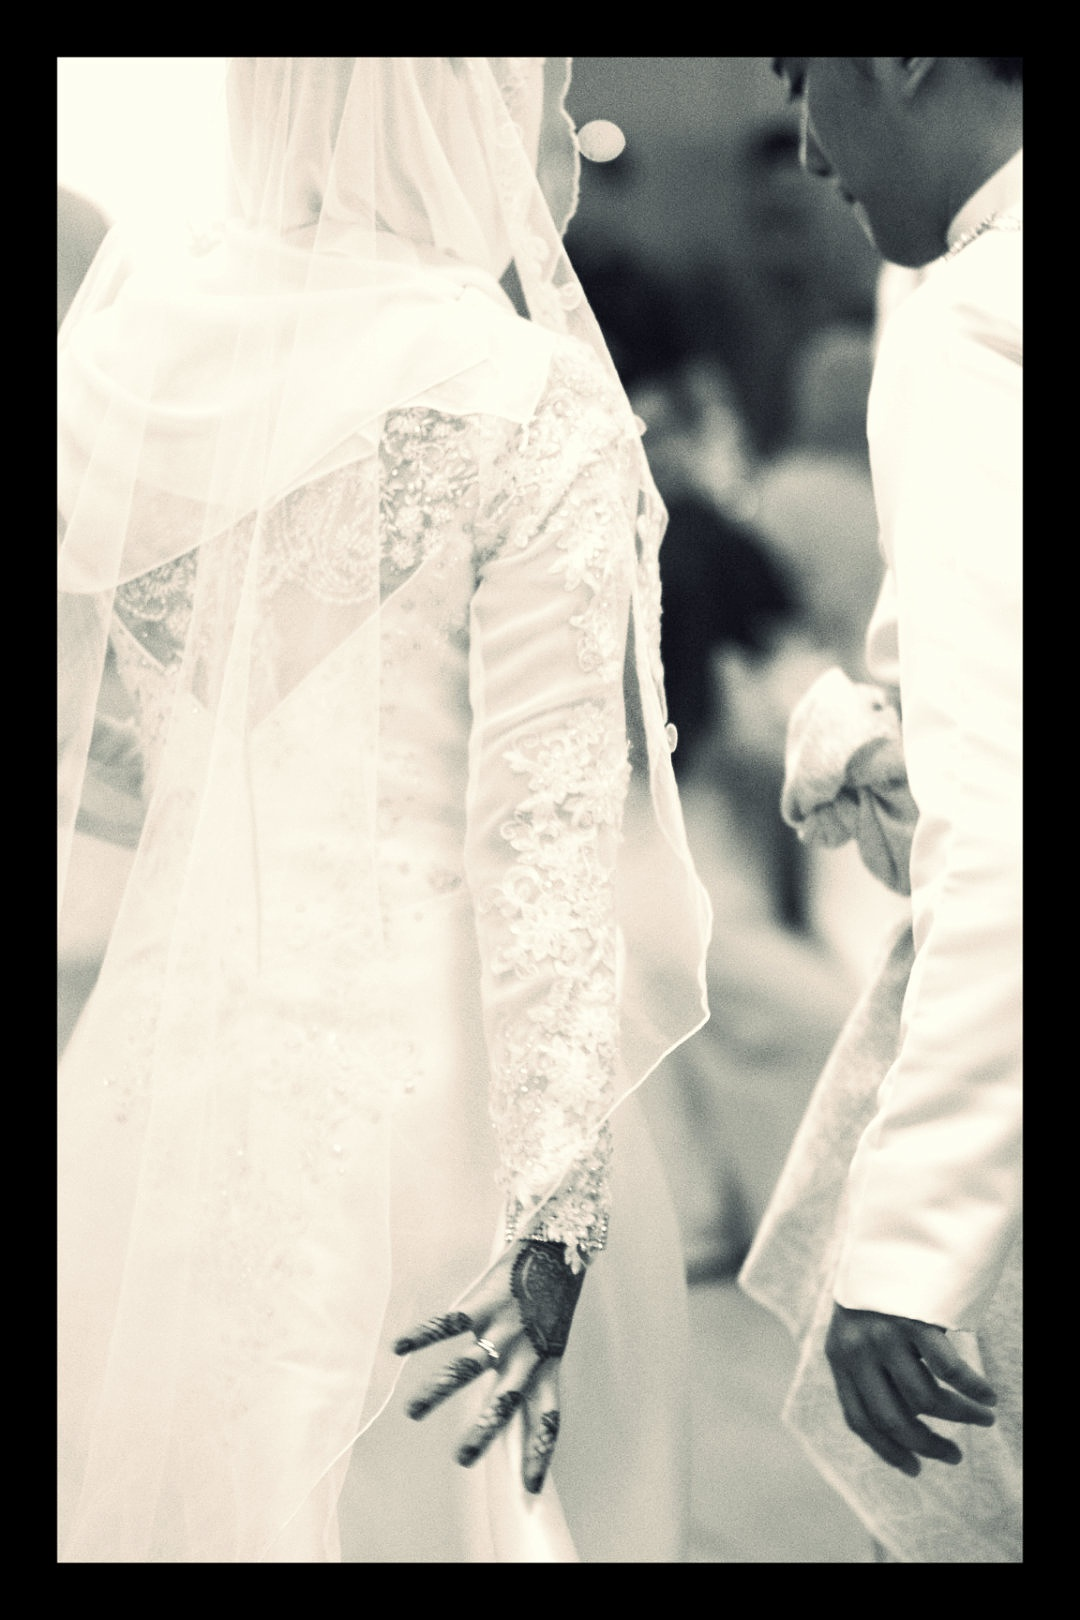 a malay wedding by Amri Rohayat